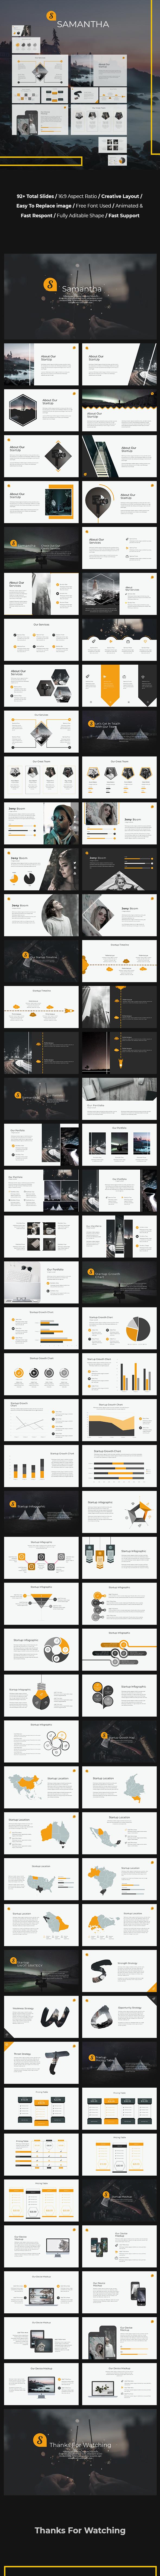 Samantha – Creative Google Slides Template - Google Slides Presentation Templates